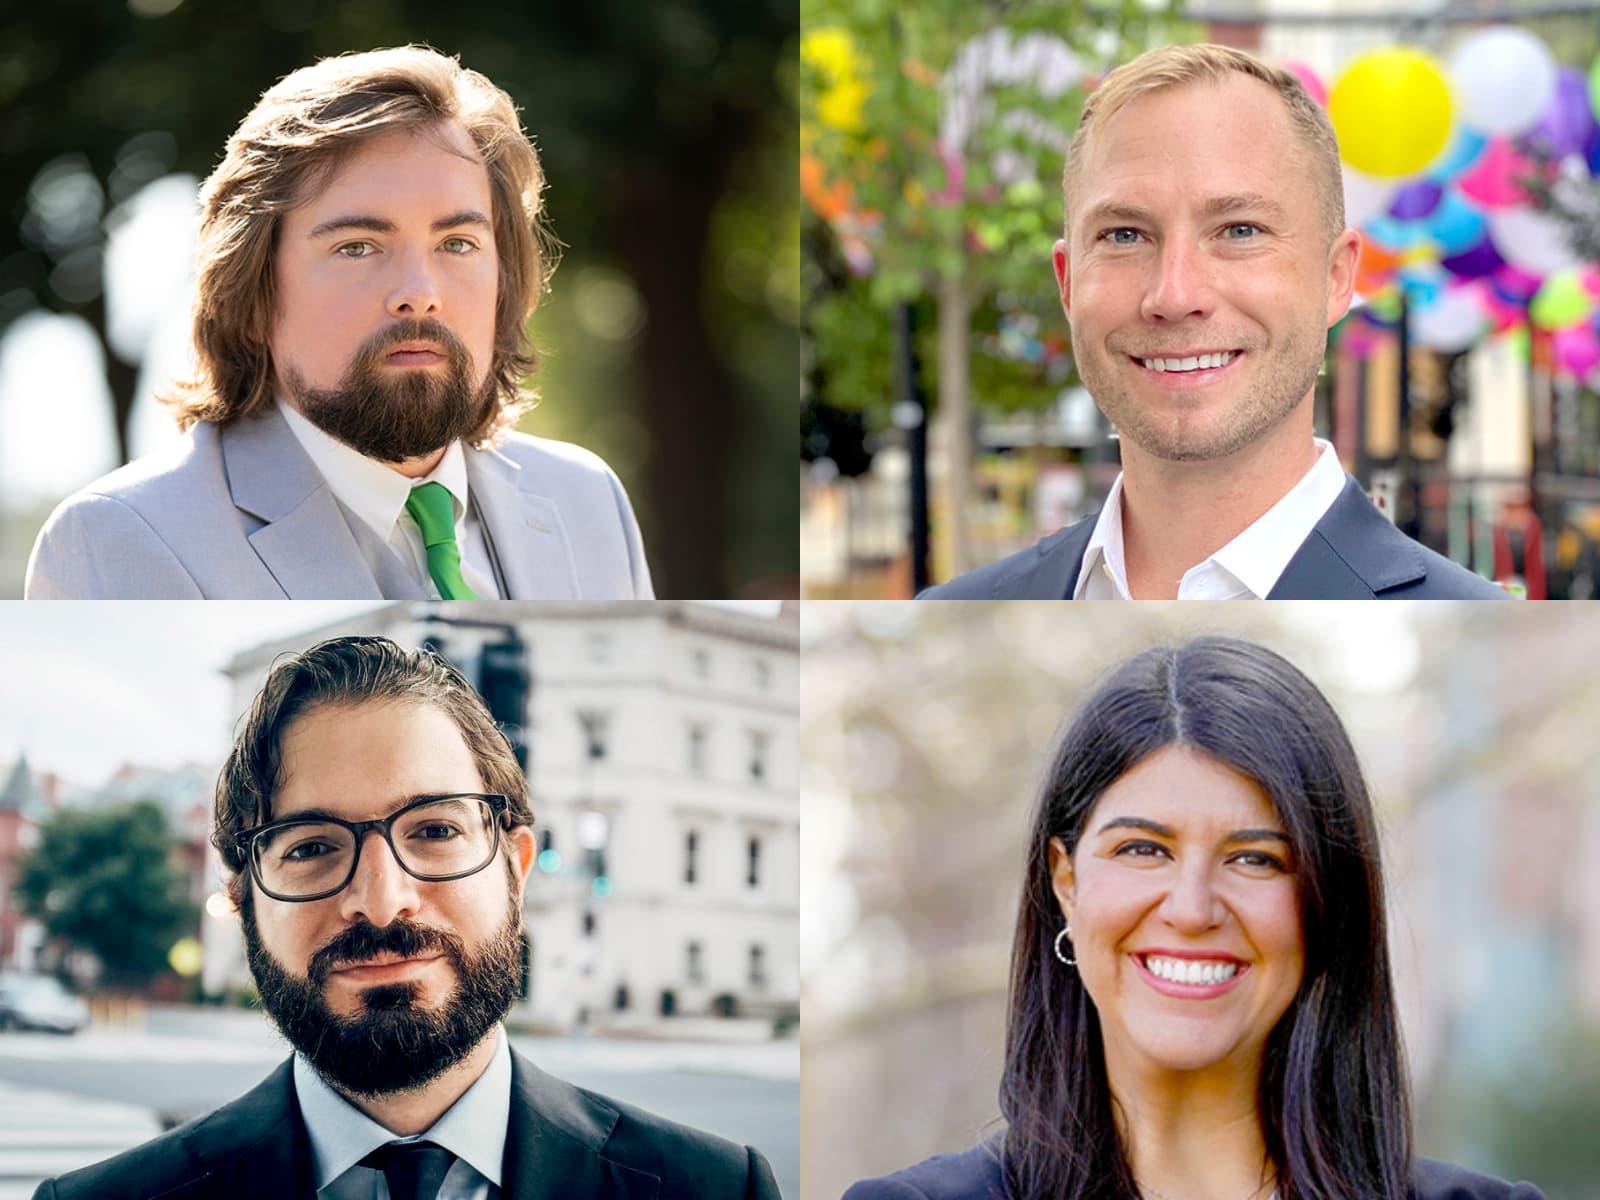 dc, ward 2, Peter Bolton, Randy Downs, Martín Miguel Fernández, Brooke Pinto